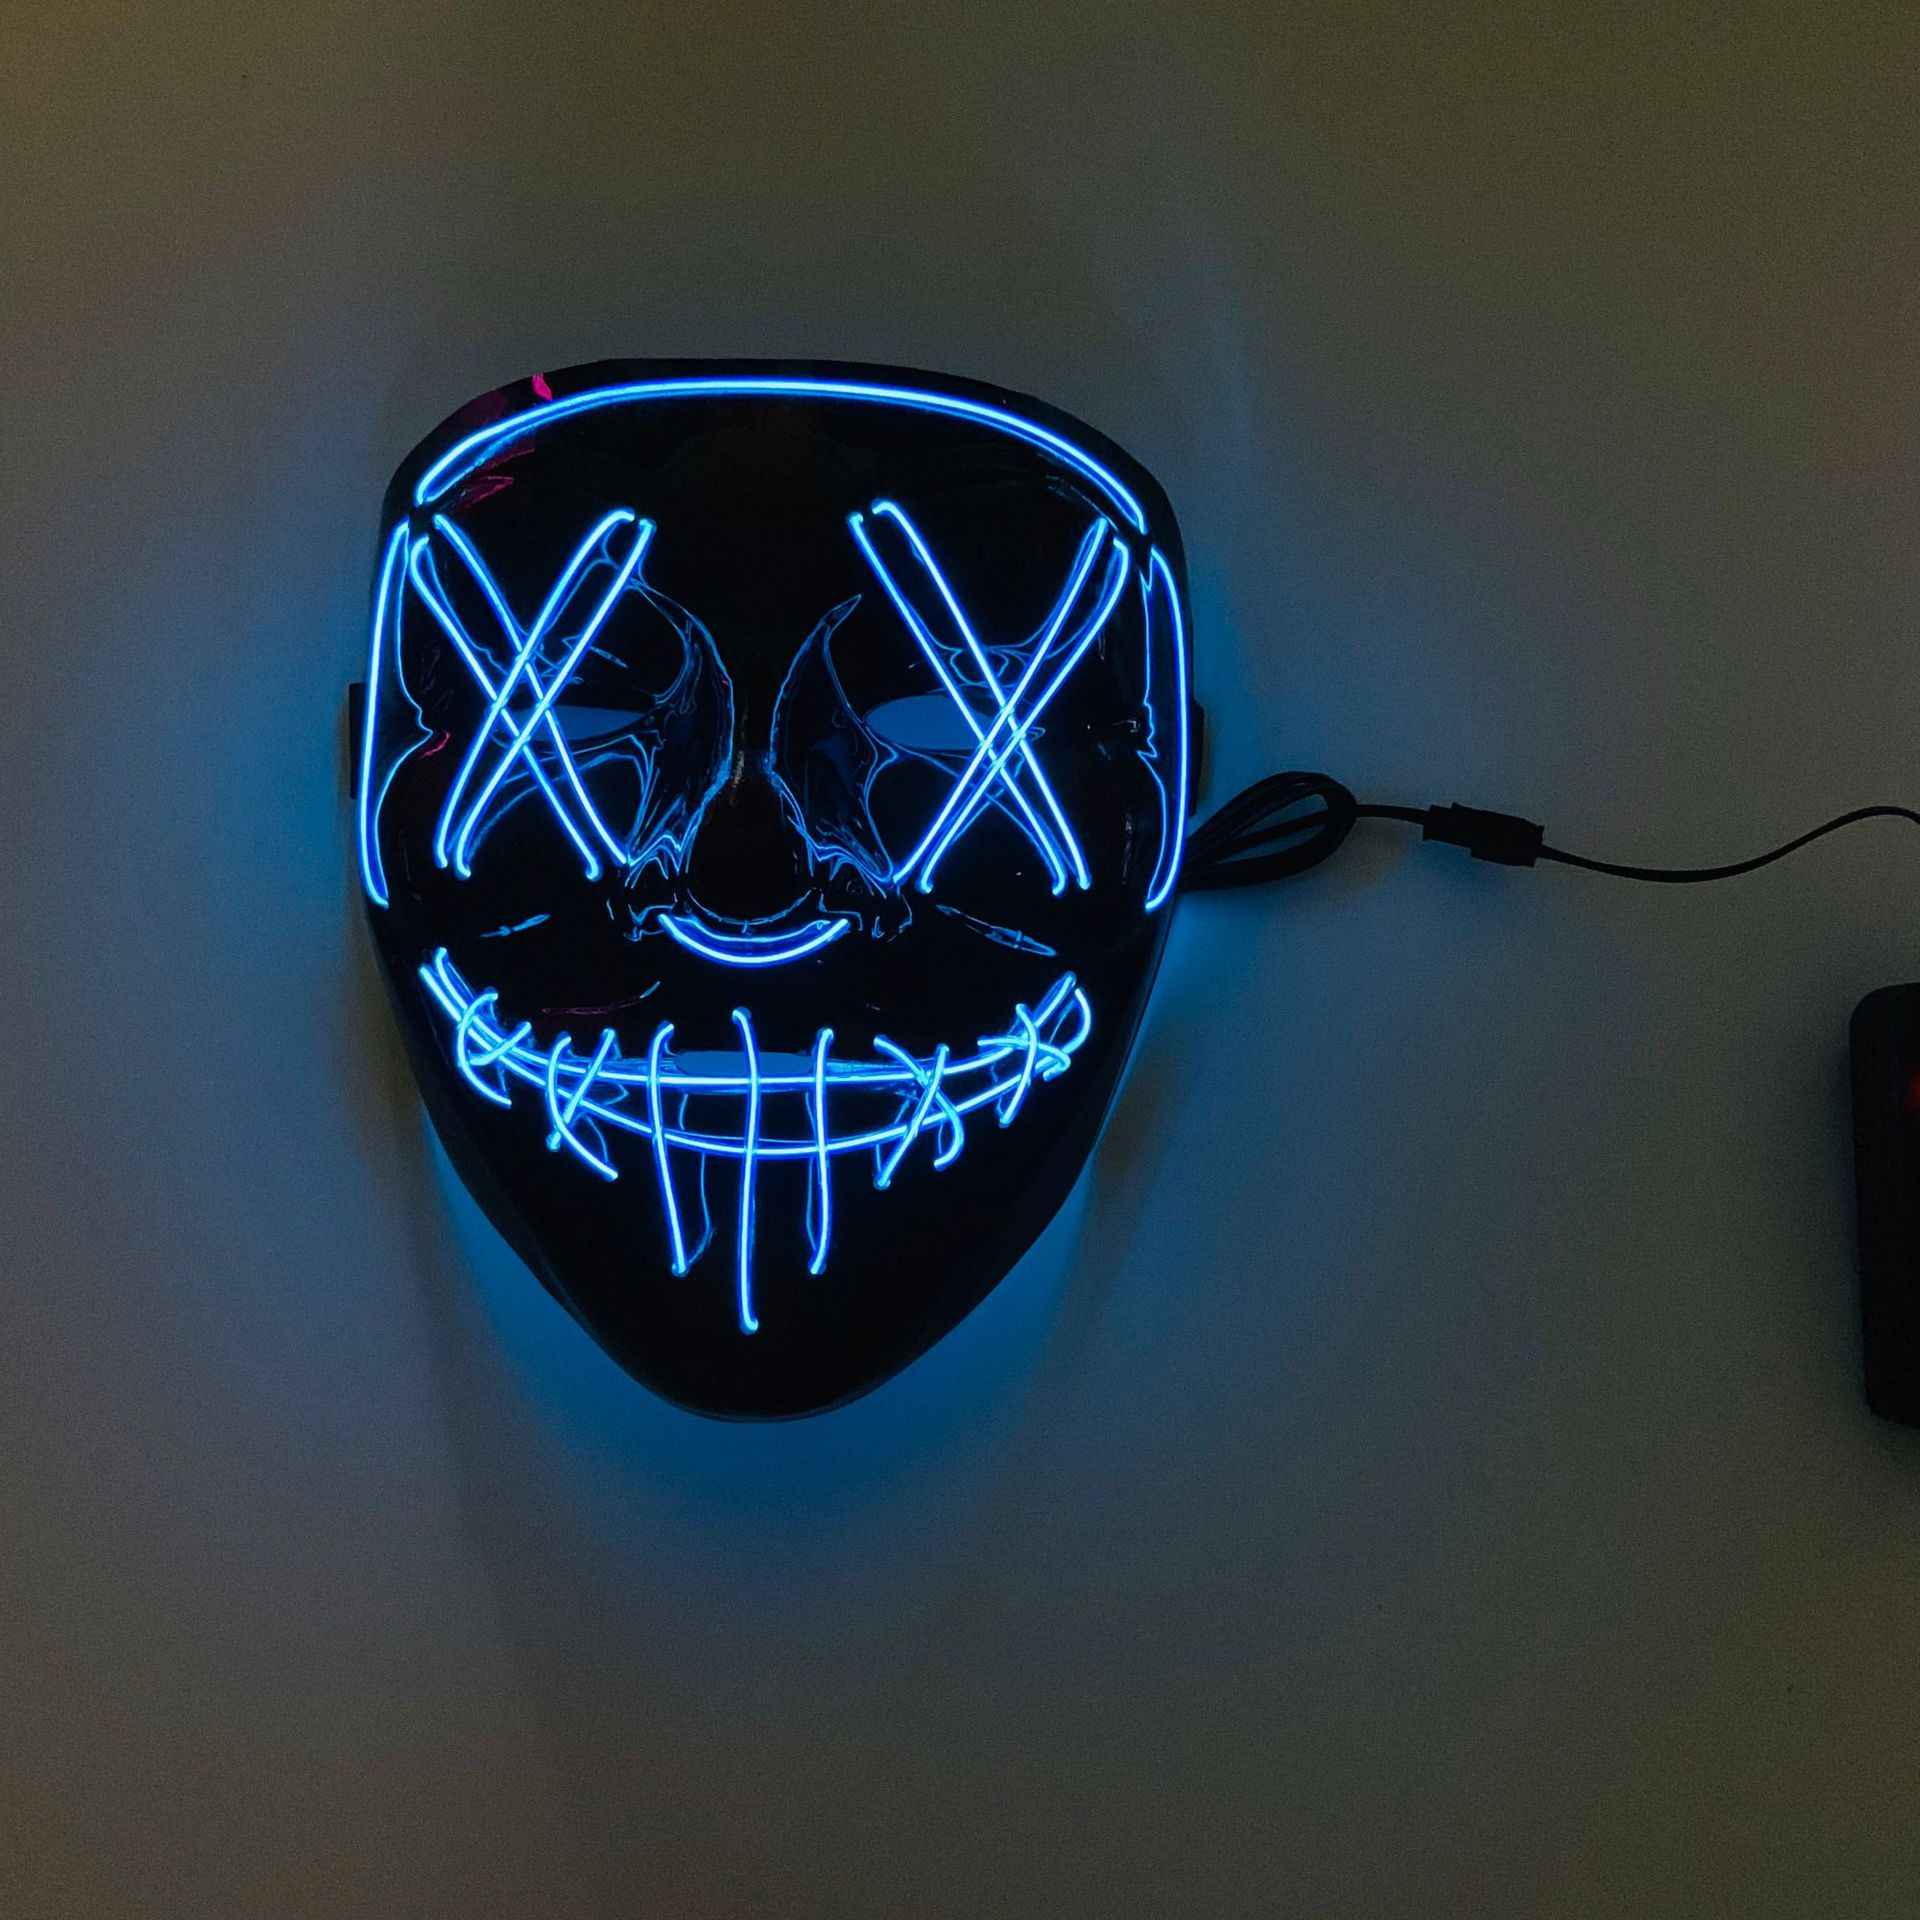 LED Masker Halloween Flash Dekorasi Topeng Prom Bar Pesta Halloween Kostum Masker Cahaya Dingin Masker untuk Halloween Festival Pesta Mainan